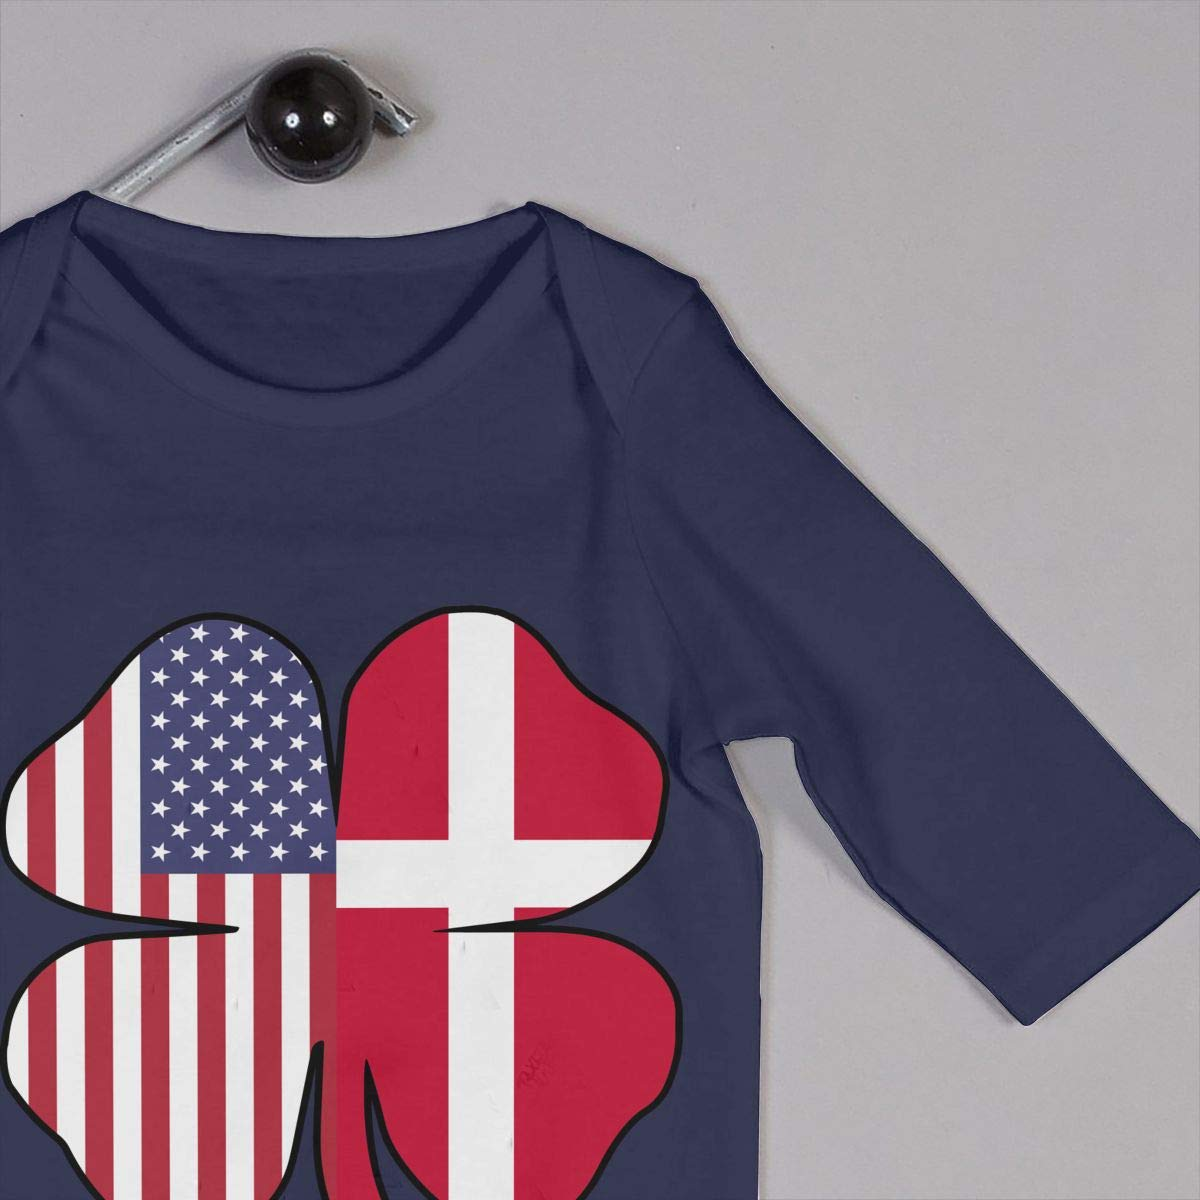 Mri-le1 Newborn Baby Jumpsuit American Denmark Flag Shamrock Baby Rompers